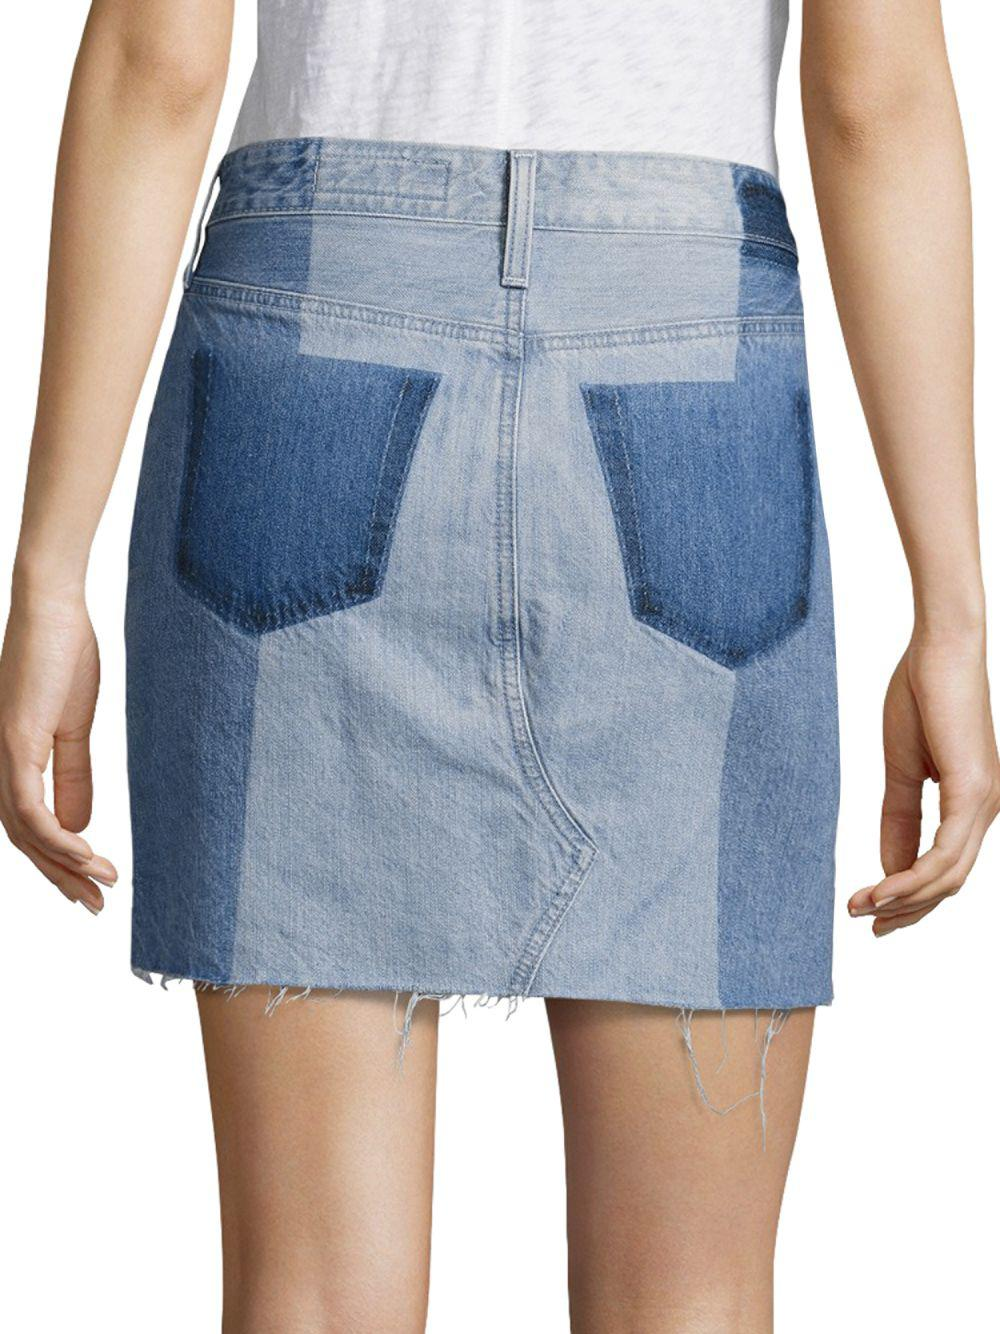 50d71a9d274 Lyst - AG Jeans Sandy Colorblock Denim Mini Skirt in Blue - Save 41%